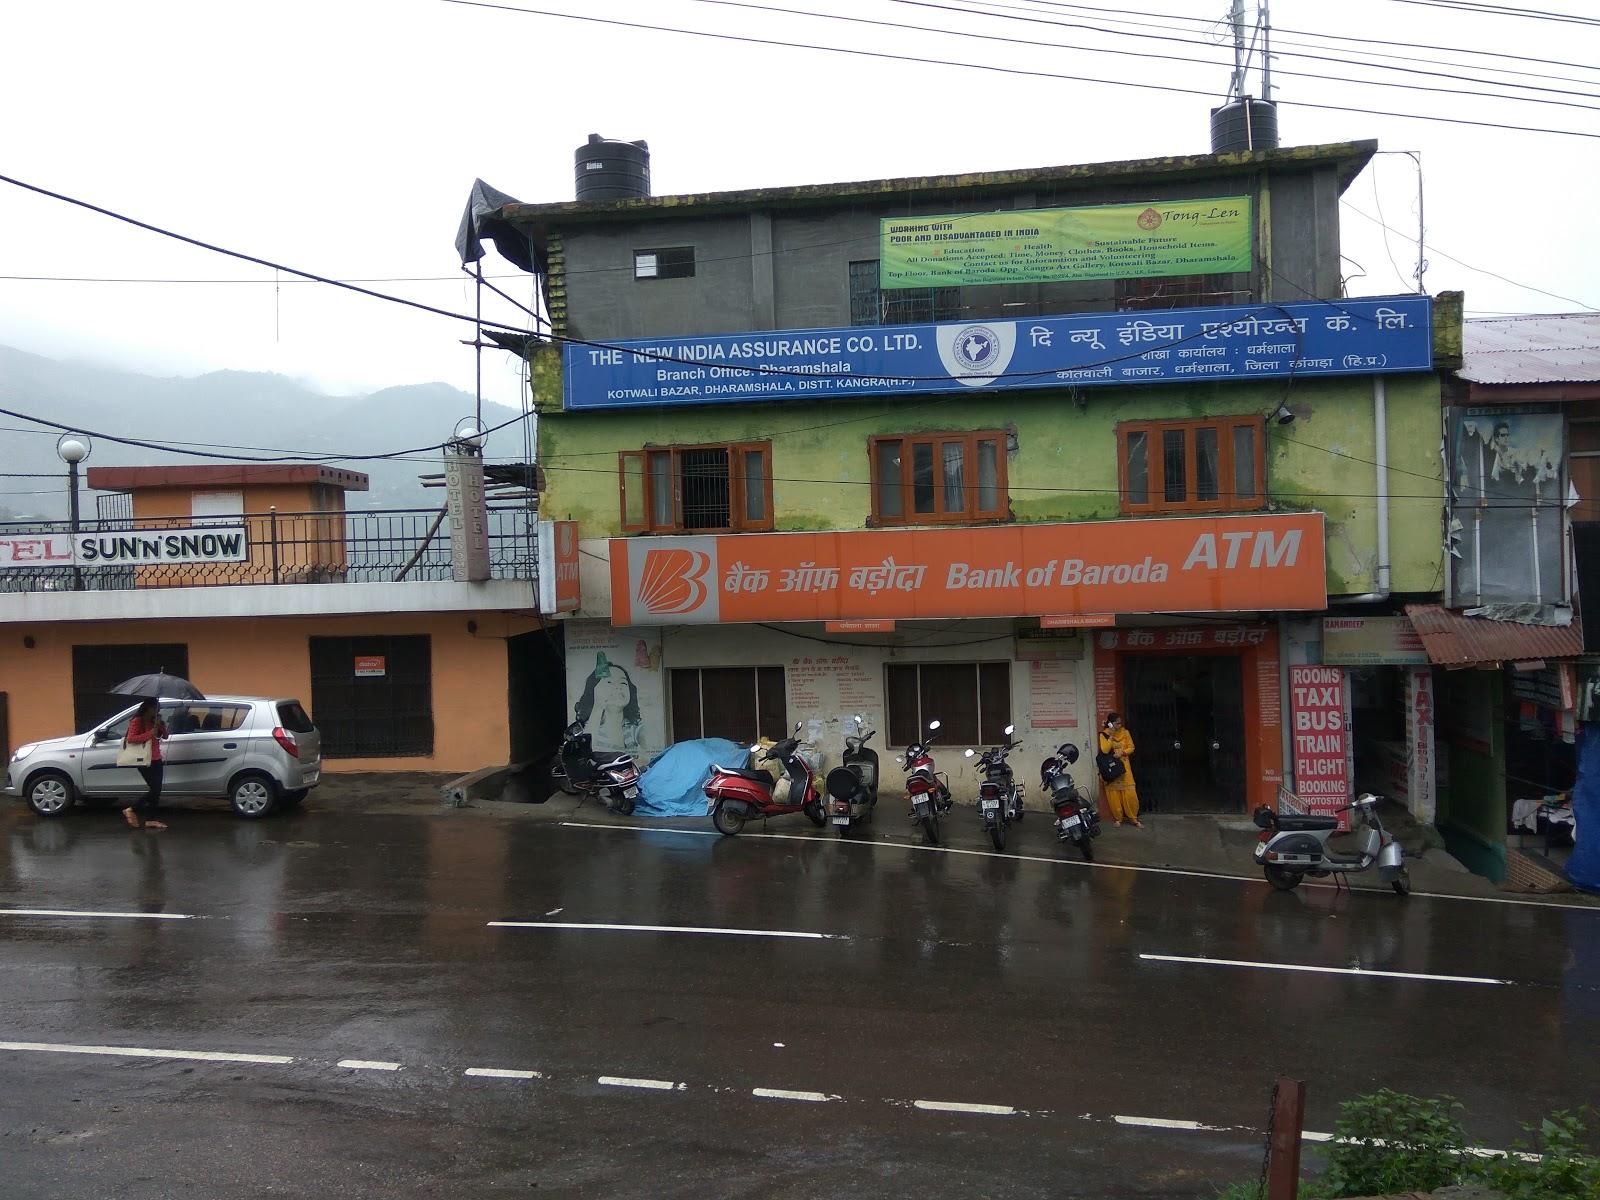 blood bank Bank Of Baroda near Dharamshala Himachal Pradesh